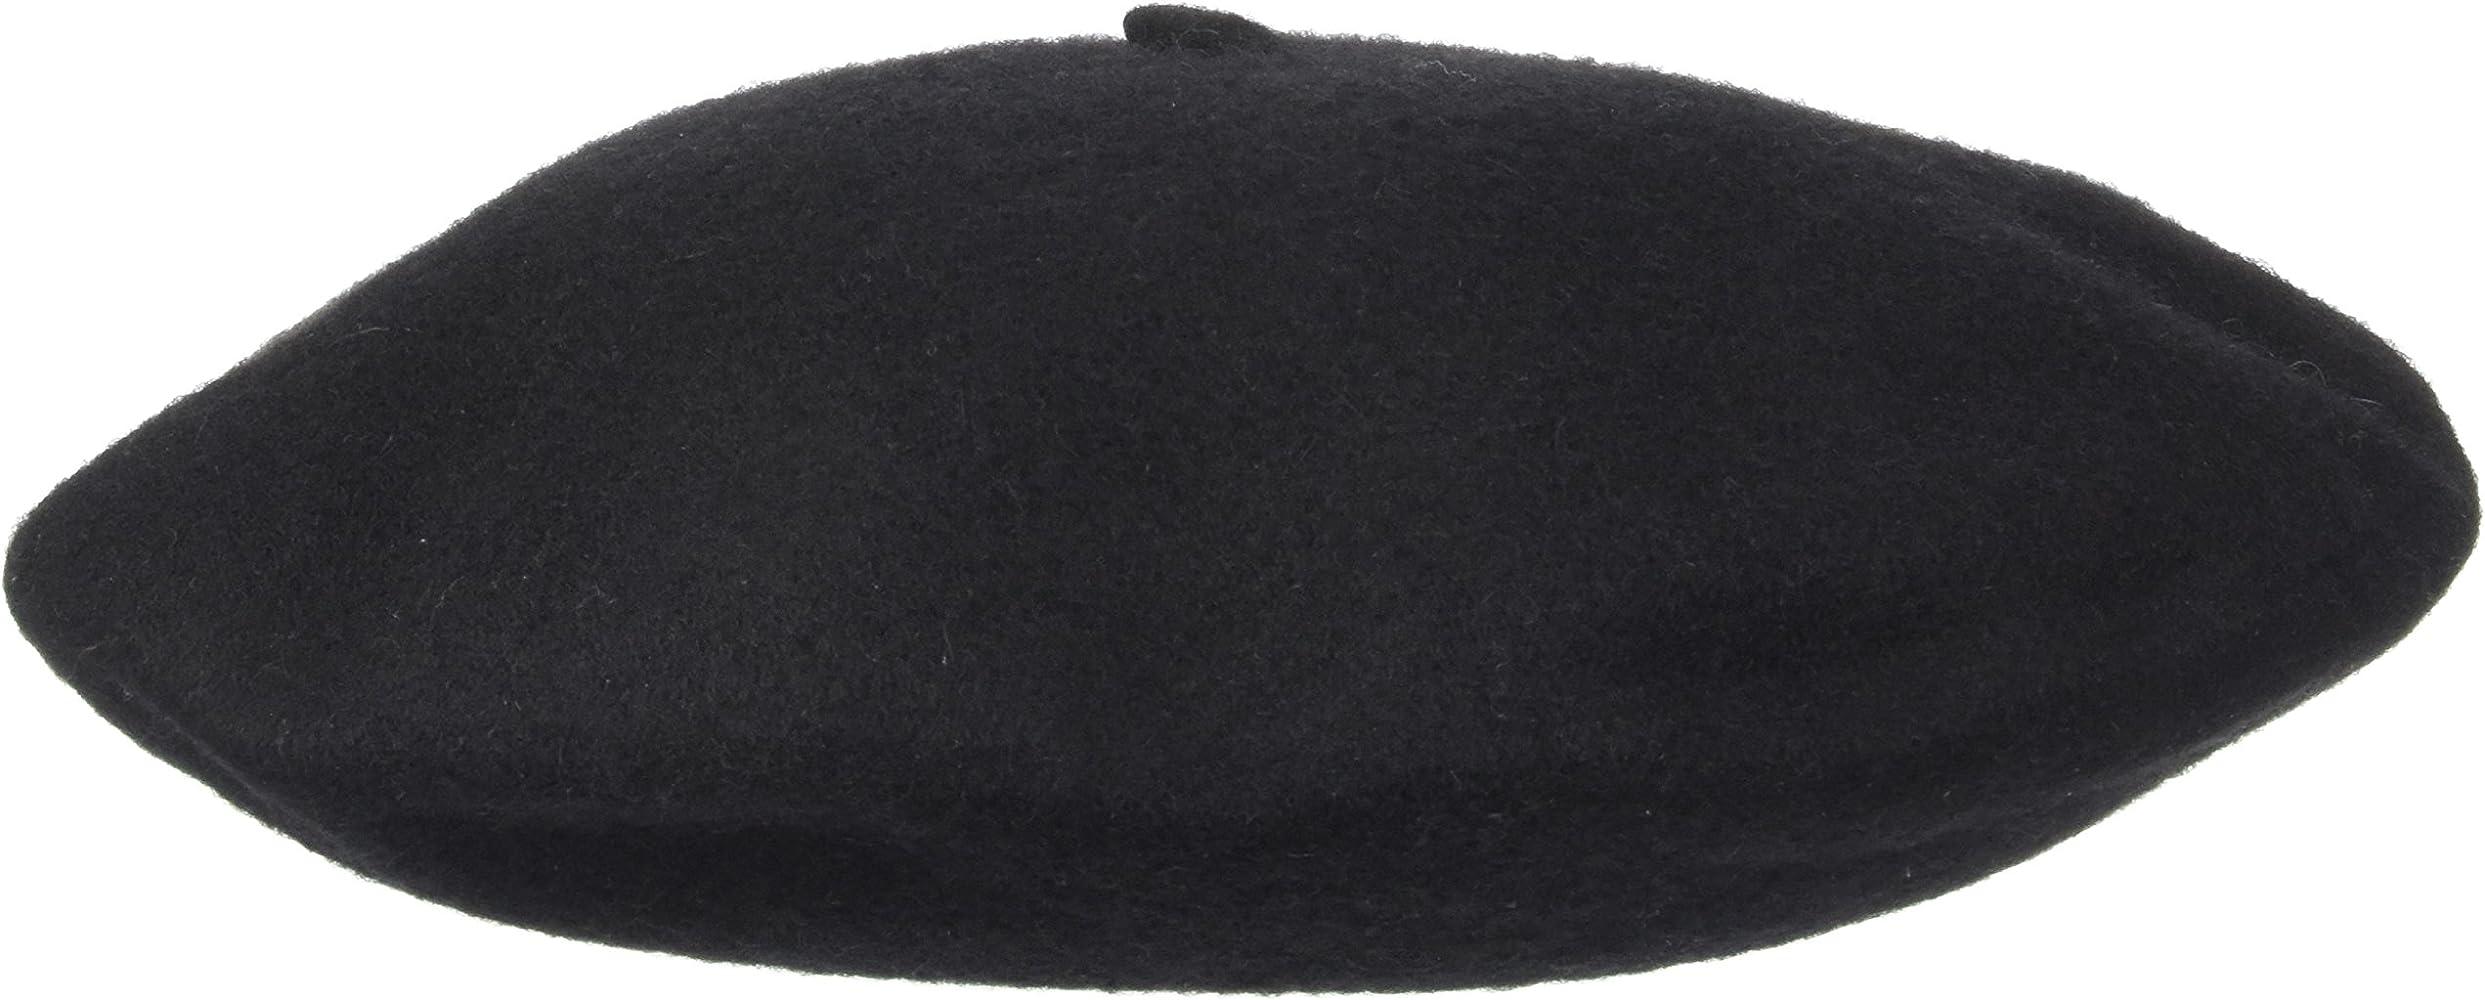 United Colors of Benetton Hat Boina, Negro (Black 700), Talla ...